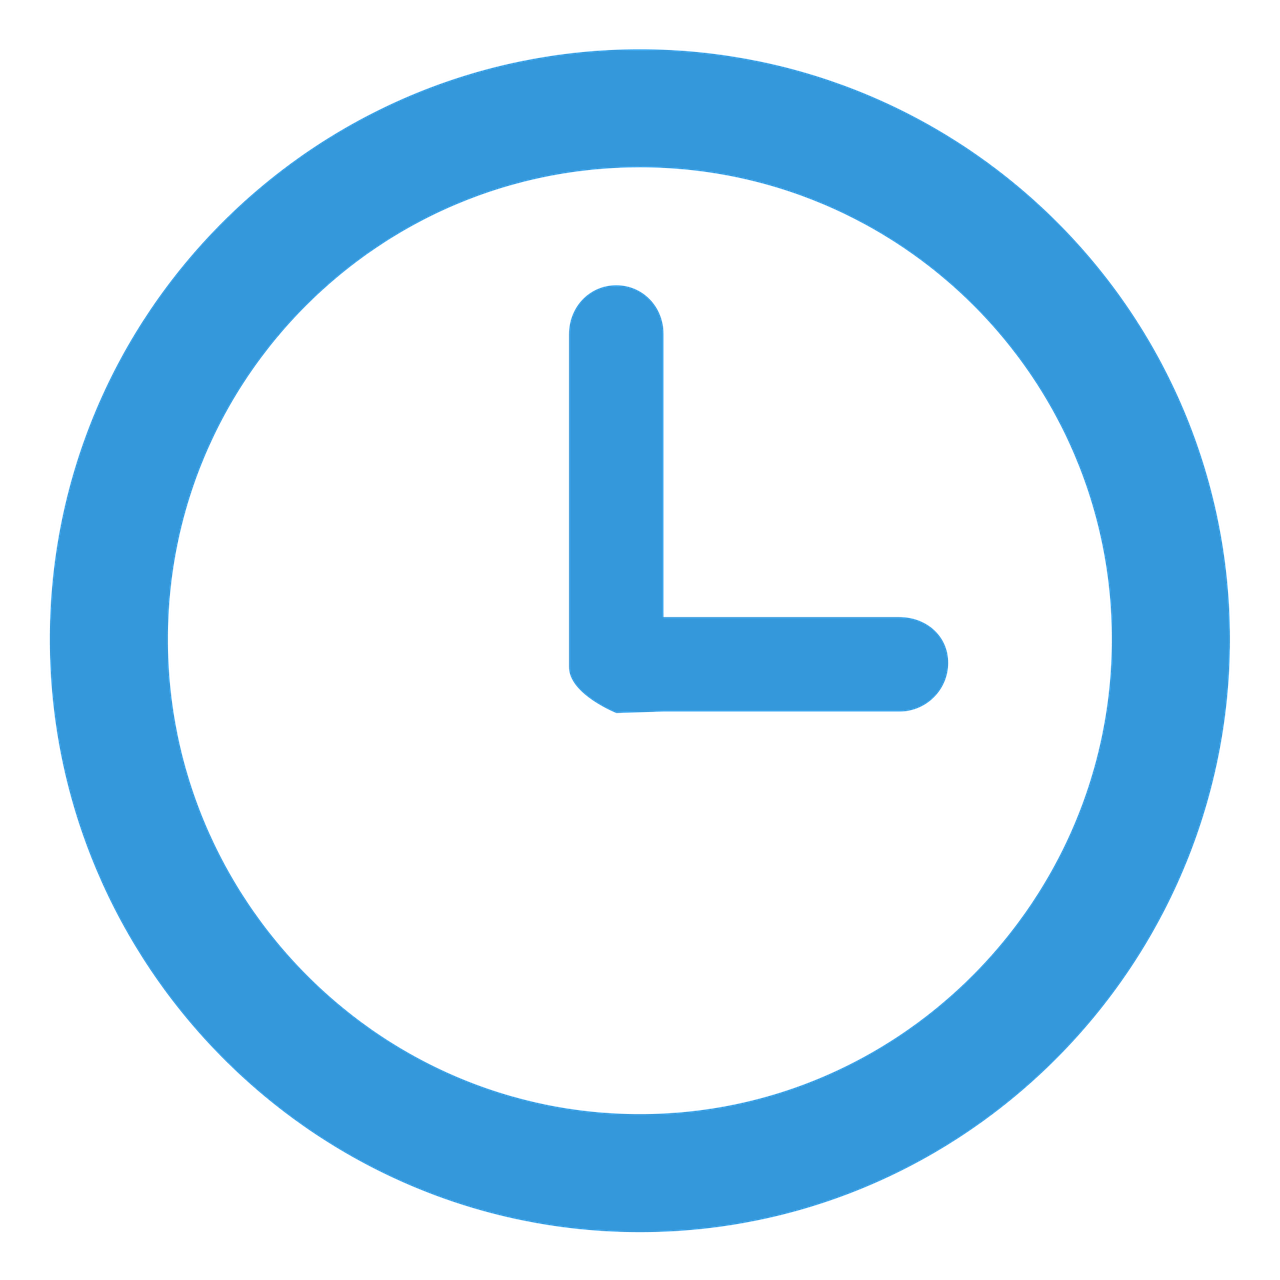 icon, symbol, design